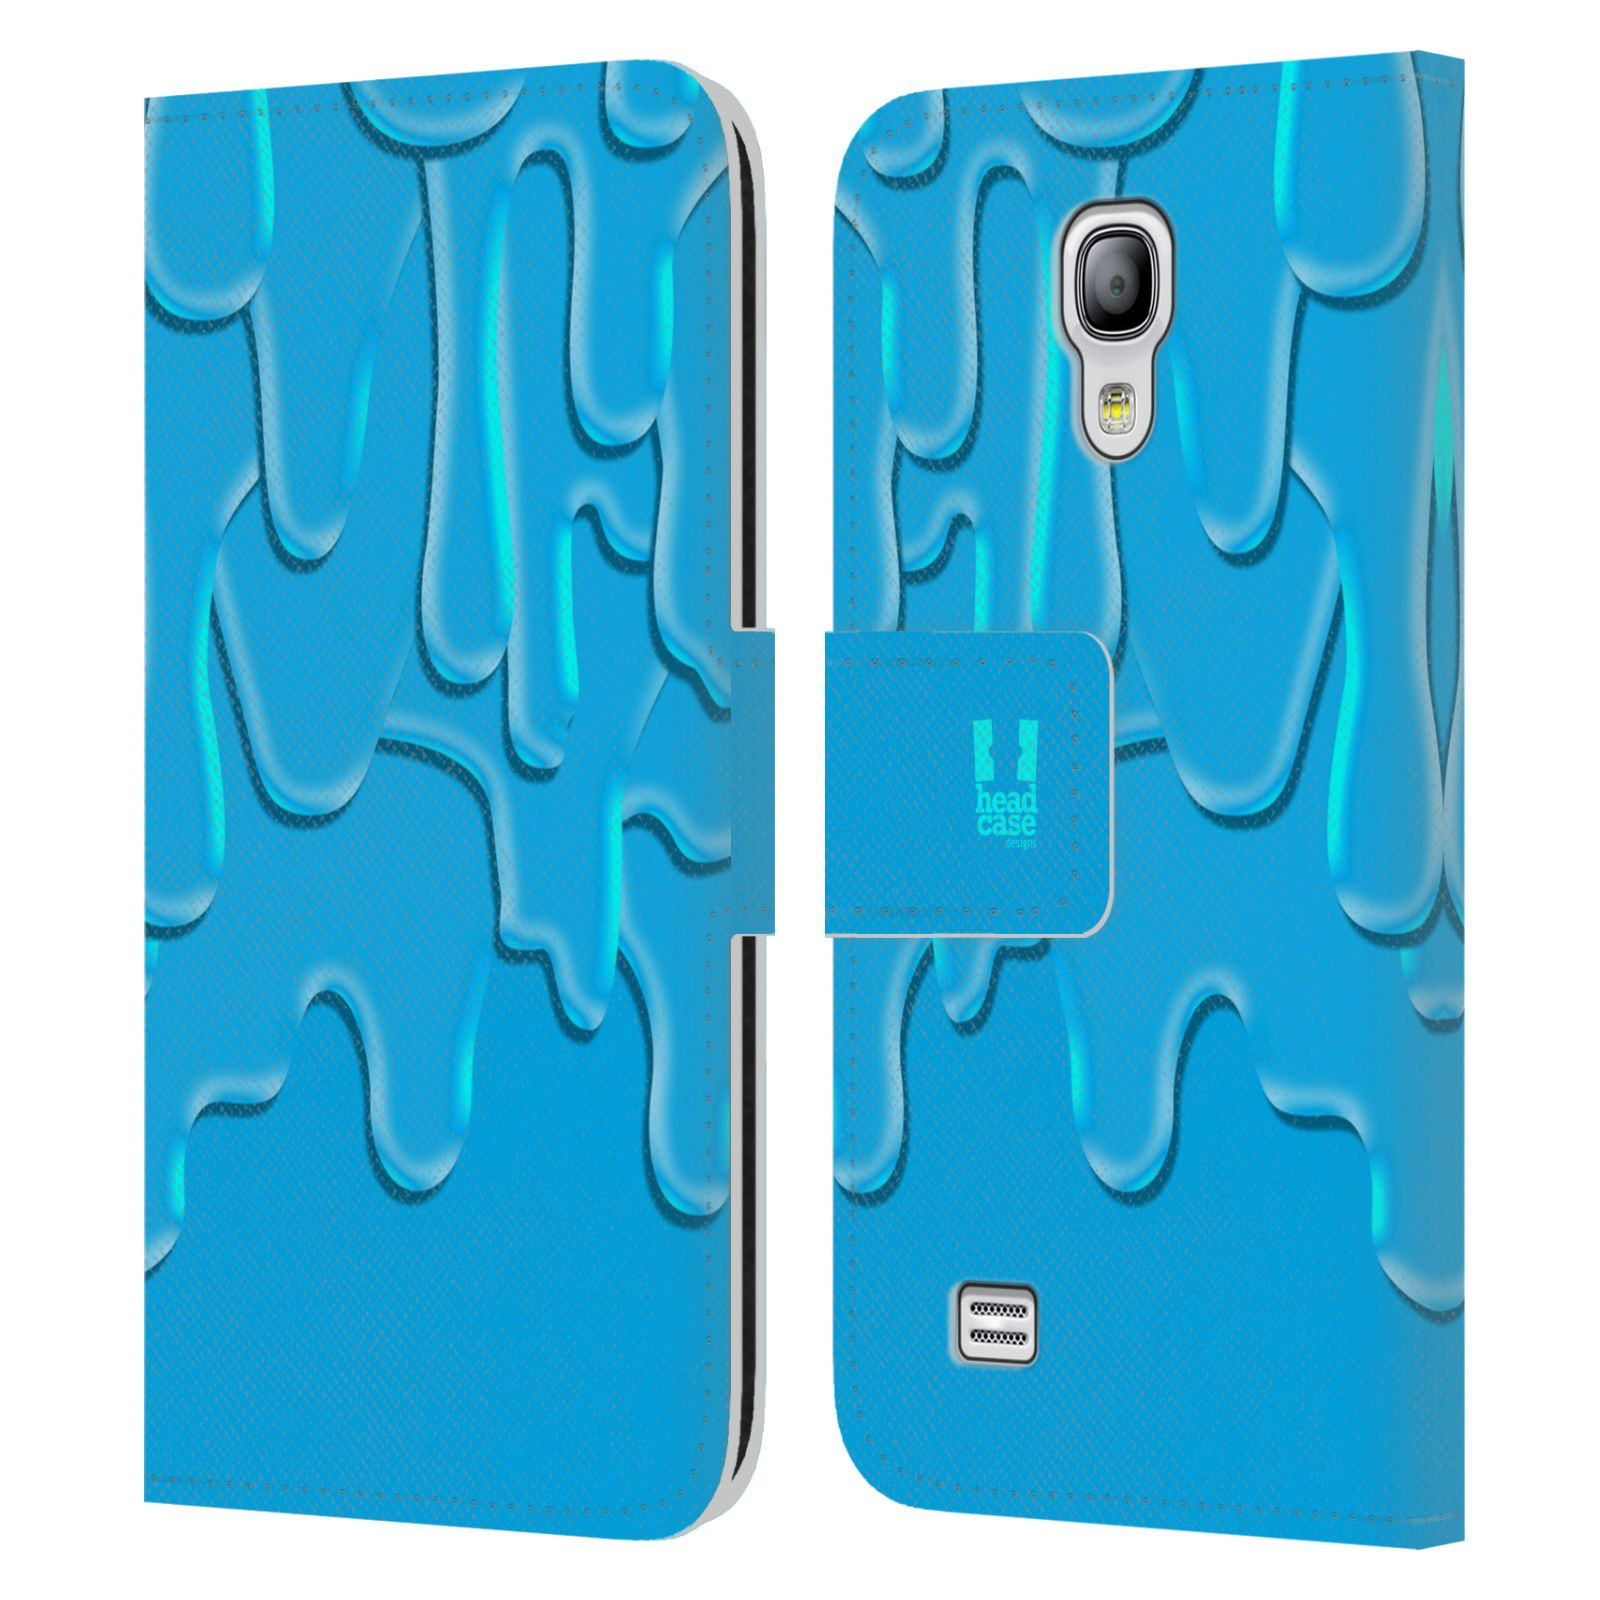 HEAD CASE Flipové pouzdro pro mobil Samsung Galaxy S4 MINI / S4 MINI DUOS ZÁPLAVA BARVA tyrkysová modrá